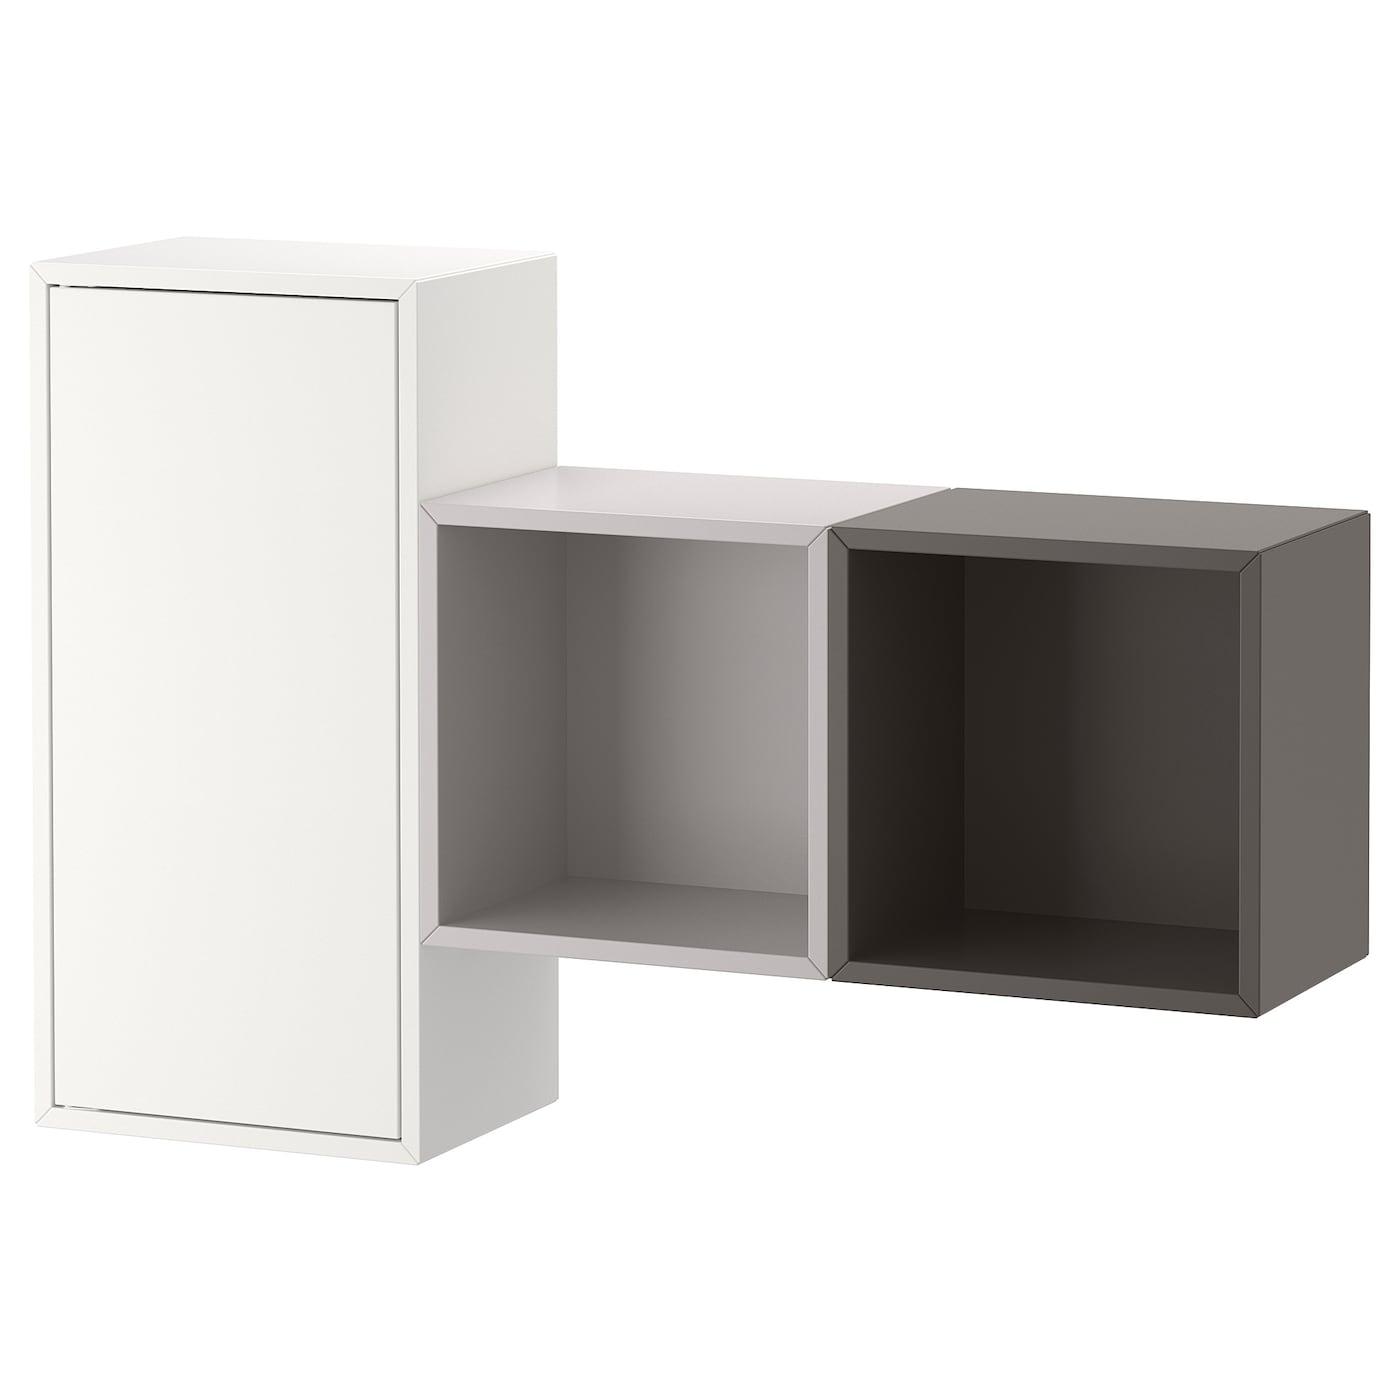 opbergsystemen rekken vakkenkasten ikea. Black Bedroom Furniture Sets. Home Design Ideas